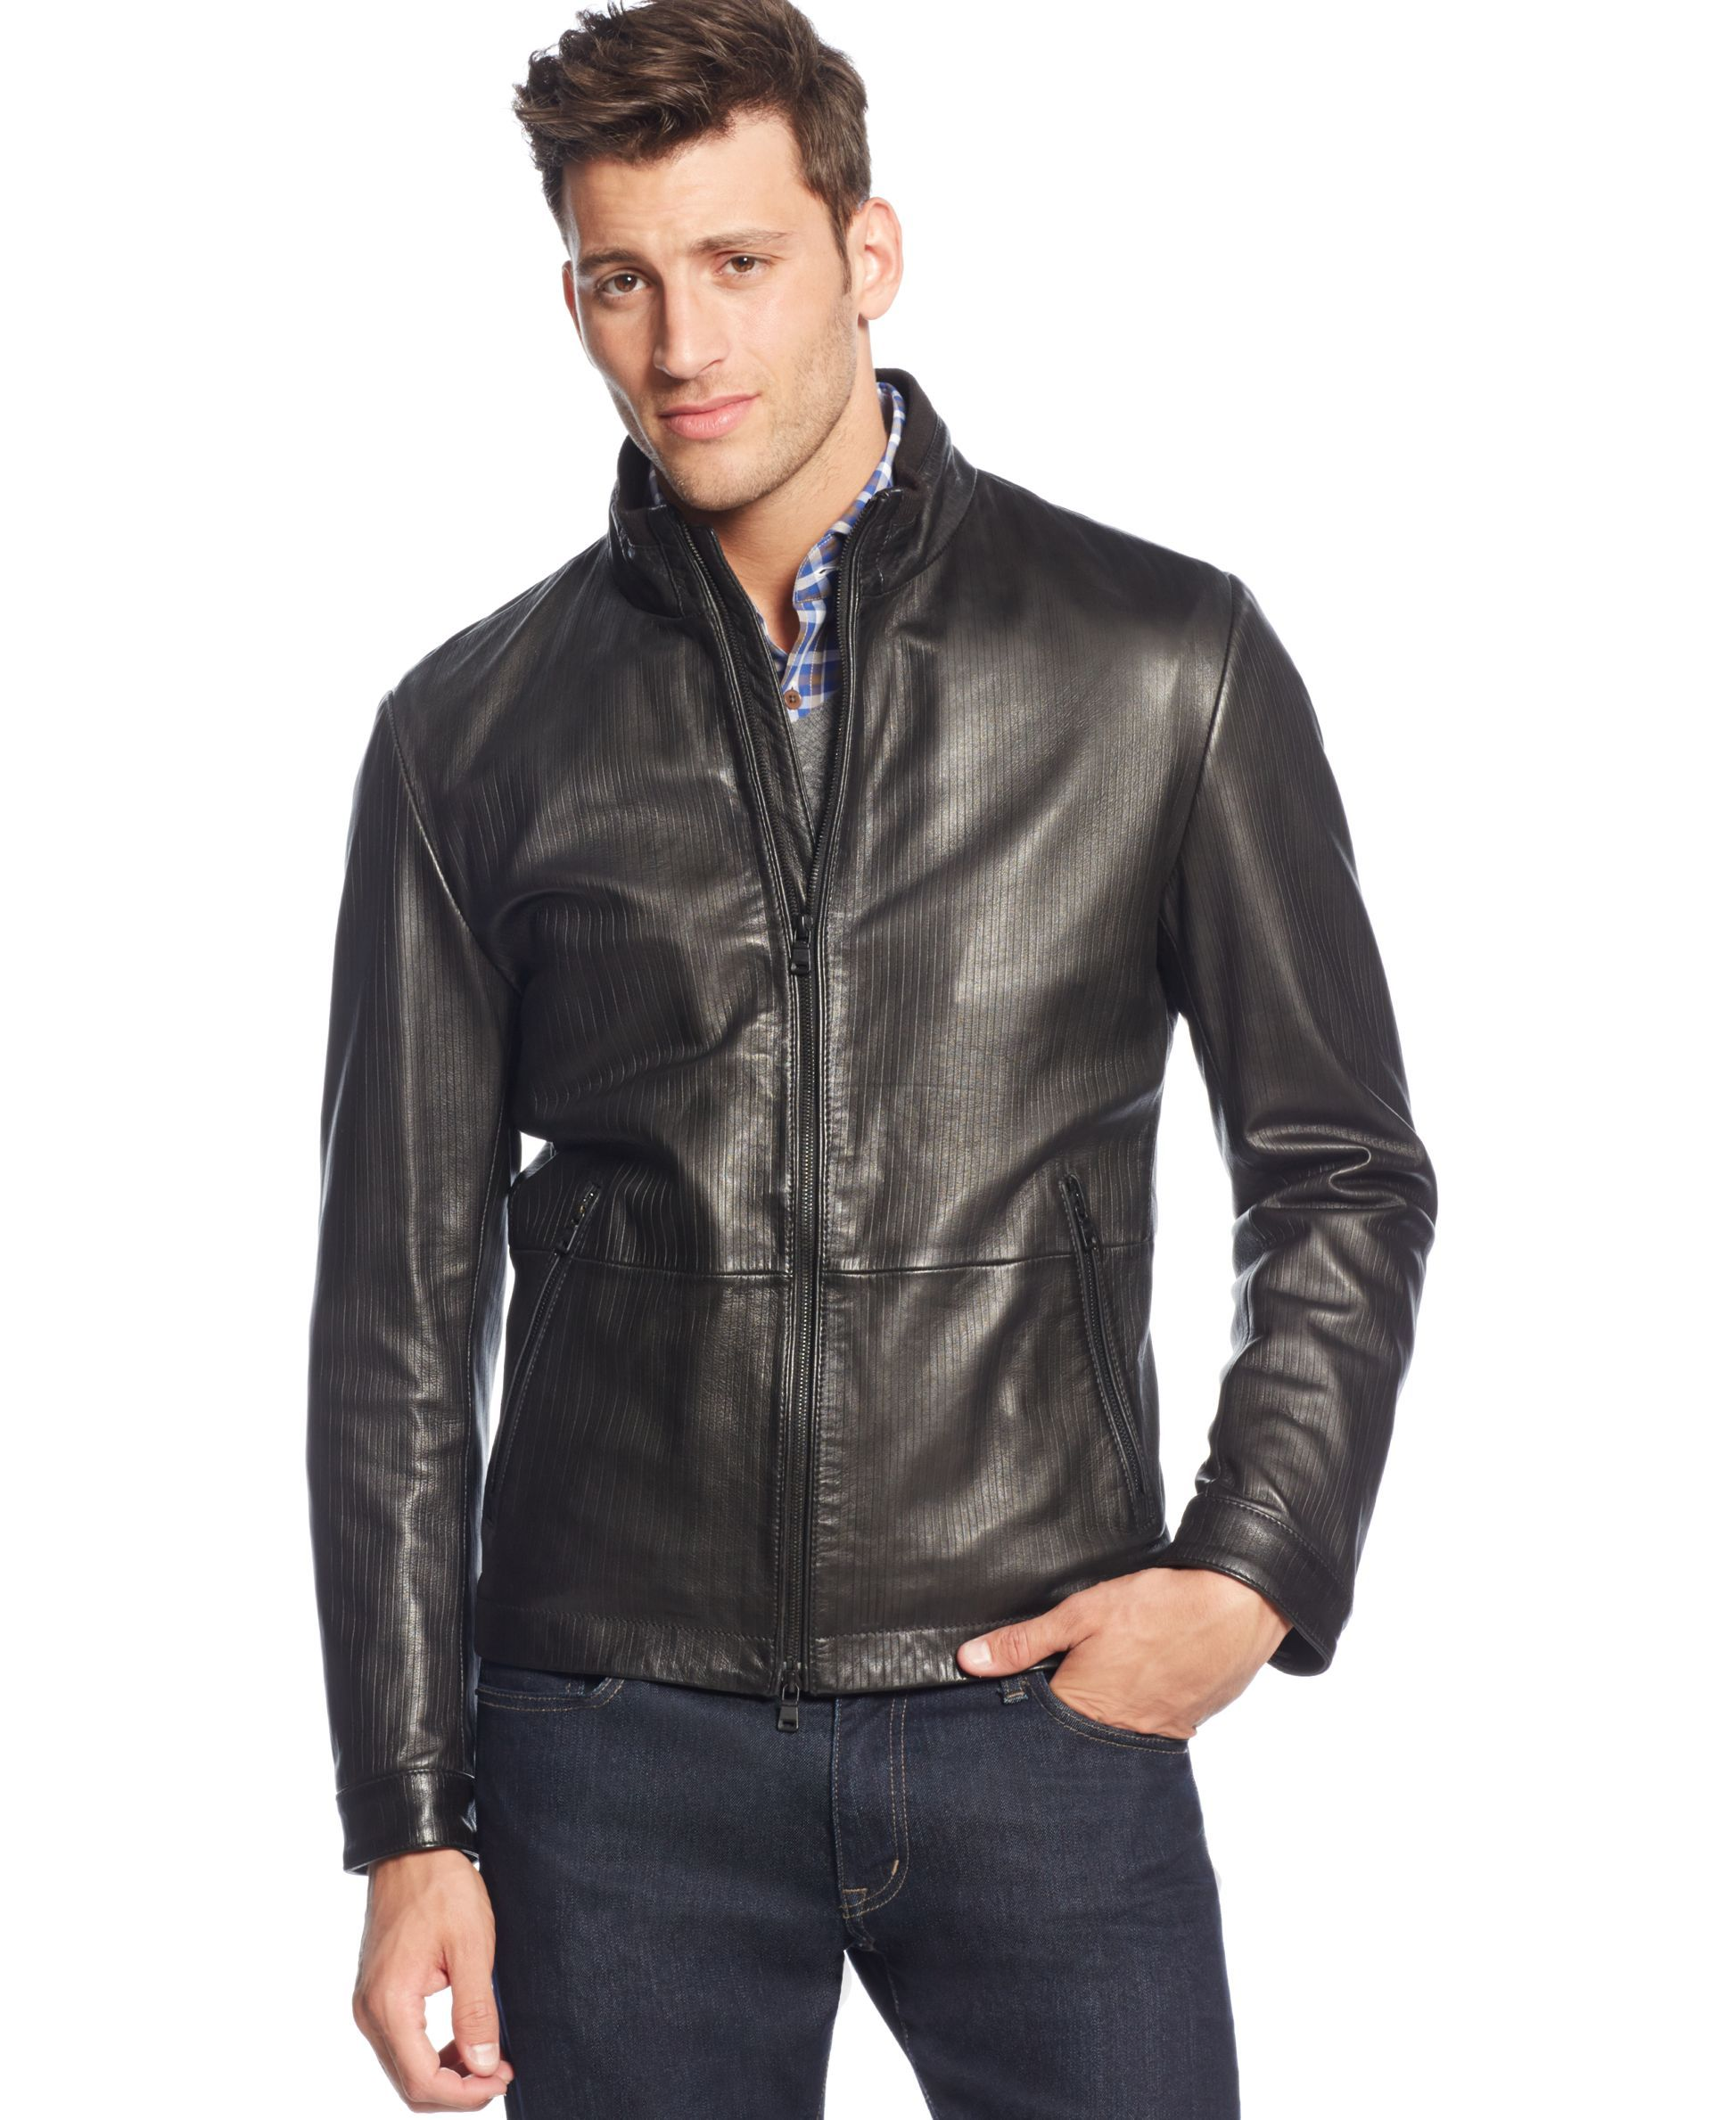 Boss Hugo Boss Garin Leather Jacket Coats Jackets Men Macy S Jackets Men Fashion Leather Jacket Jackets [ 2378 x 1947 Pixel ]